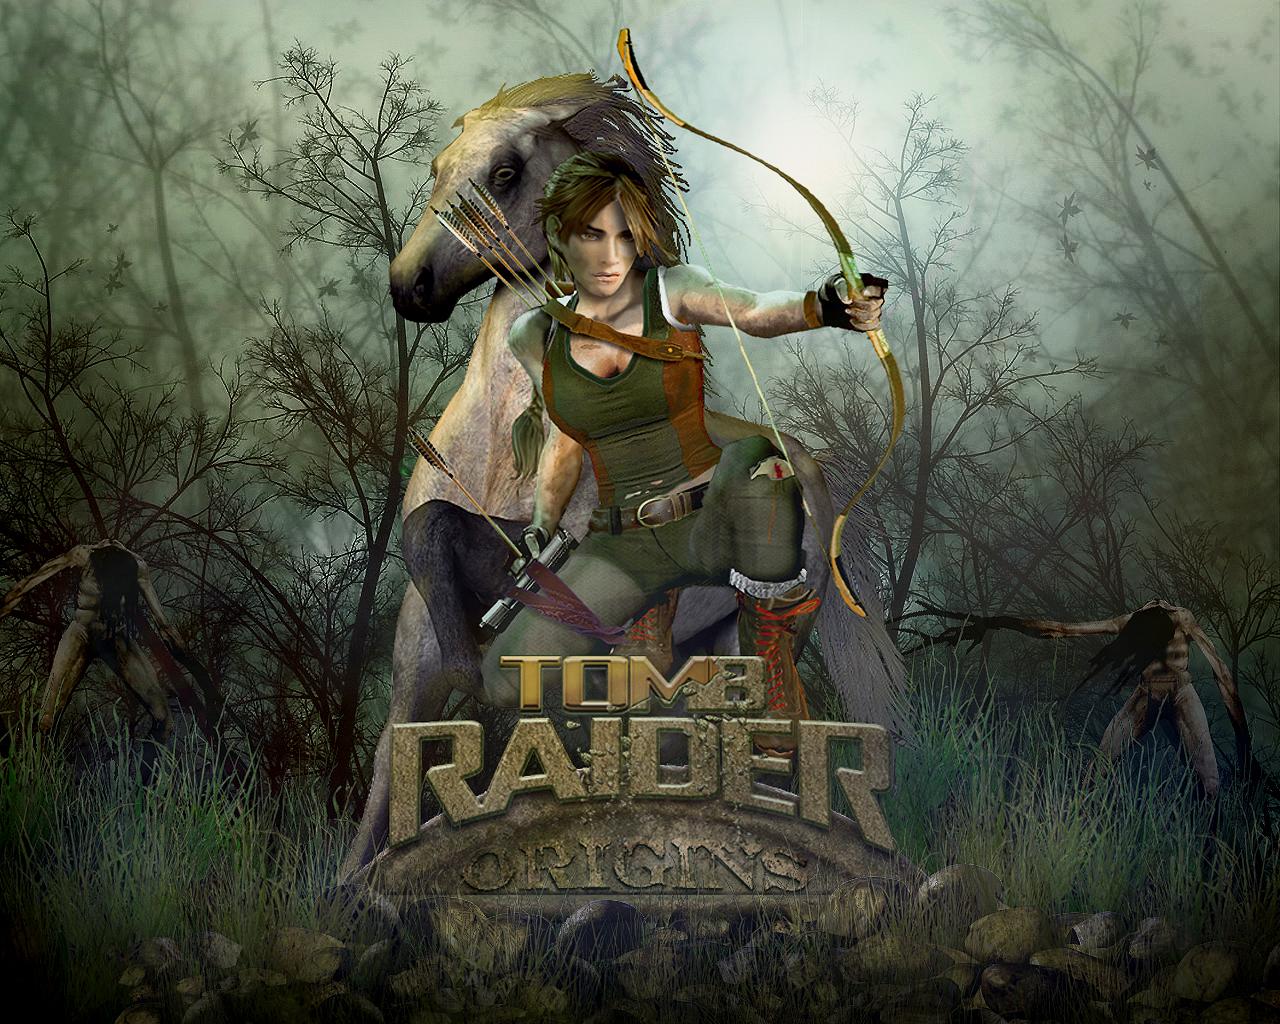 tomb raider 9 origins. Black Bedroom Furniture Sets. Home Design Ideas